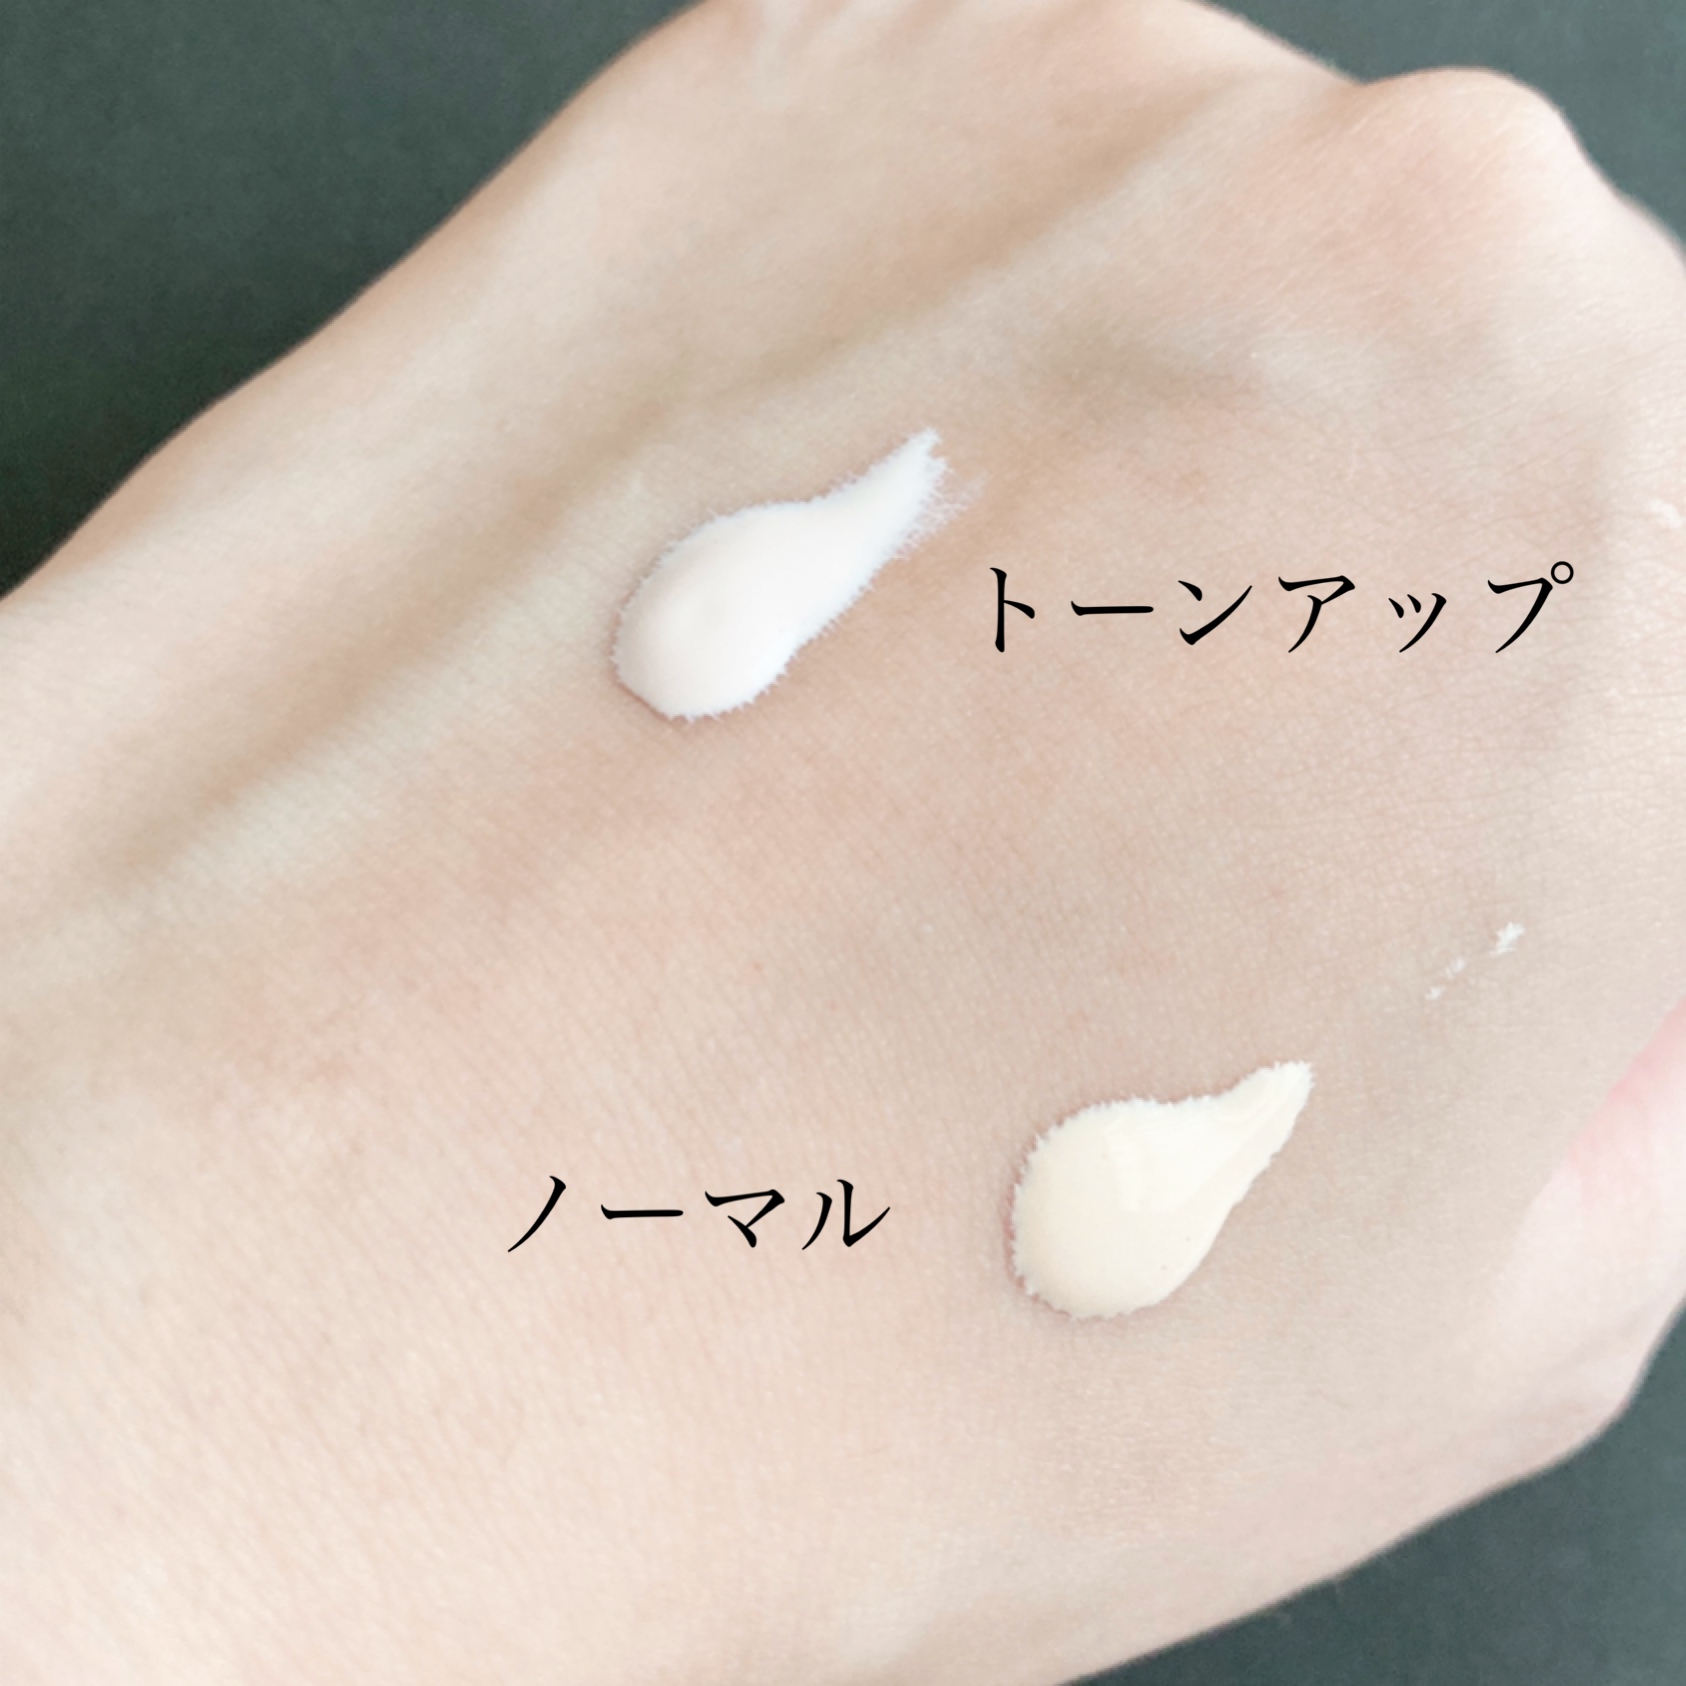 SOFINA Primavista(ソフィーナ プリマヴィスタ)皮脂くずれ防止 化粧下地を使ったyunaさんのクチコミ画像5